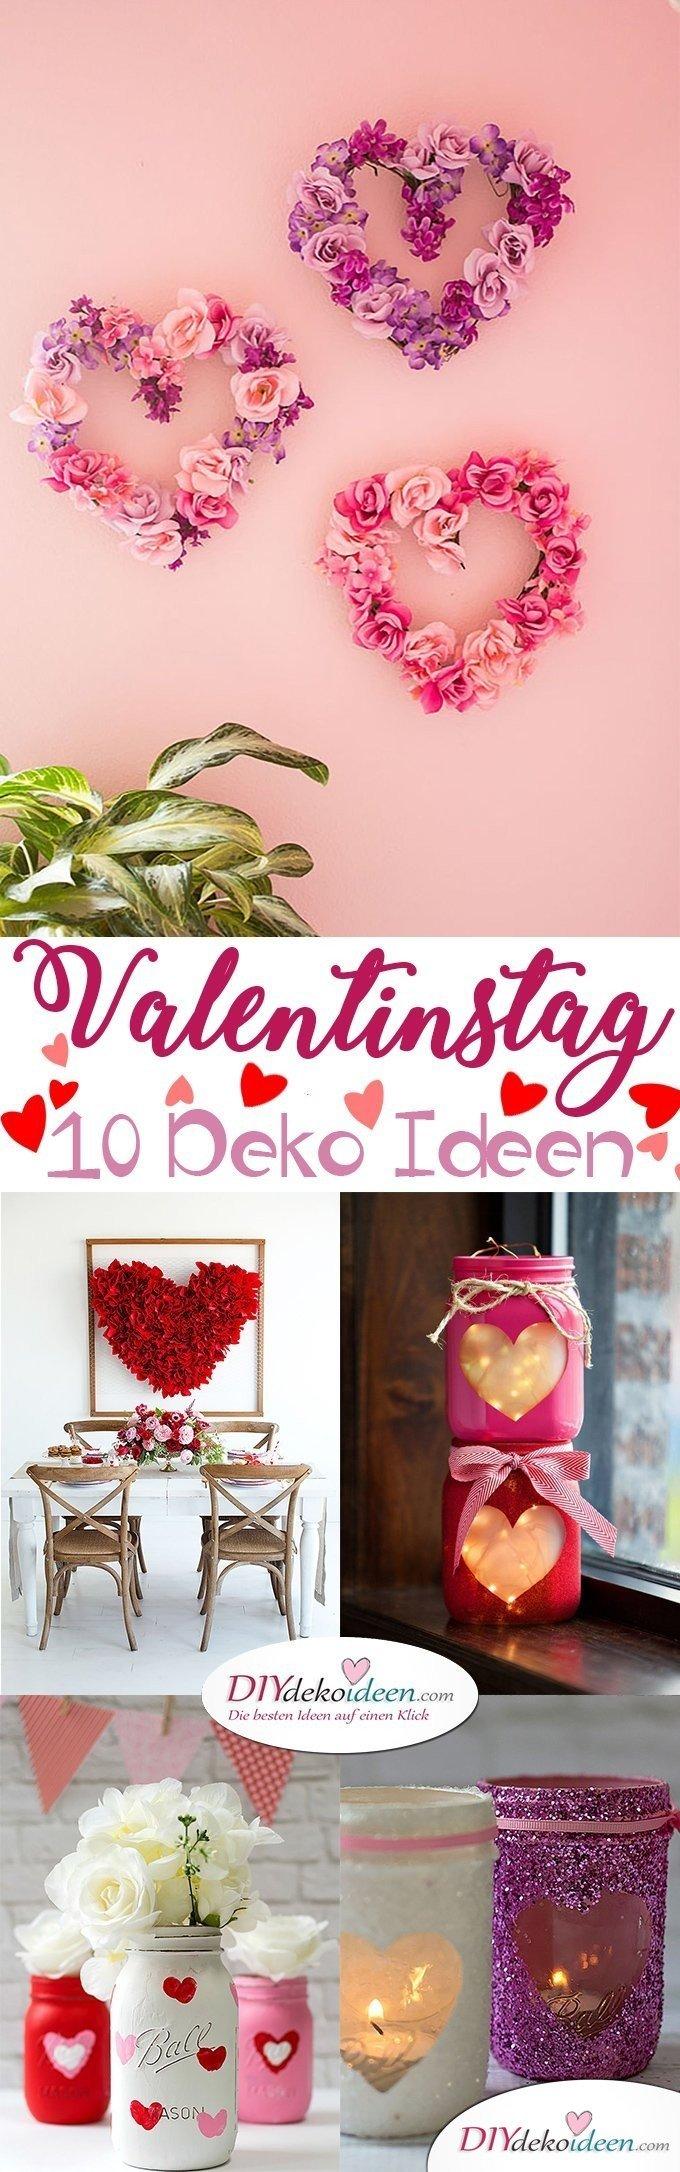 Valentinstag 10 Deko Ideen, Blumenherzen, Valentinstag Deko Ideen, Deko Valentinstag, dekorieren, DIY Dekoideen, Deko basteln, romantische Deko,